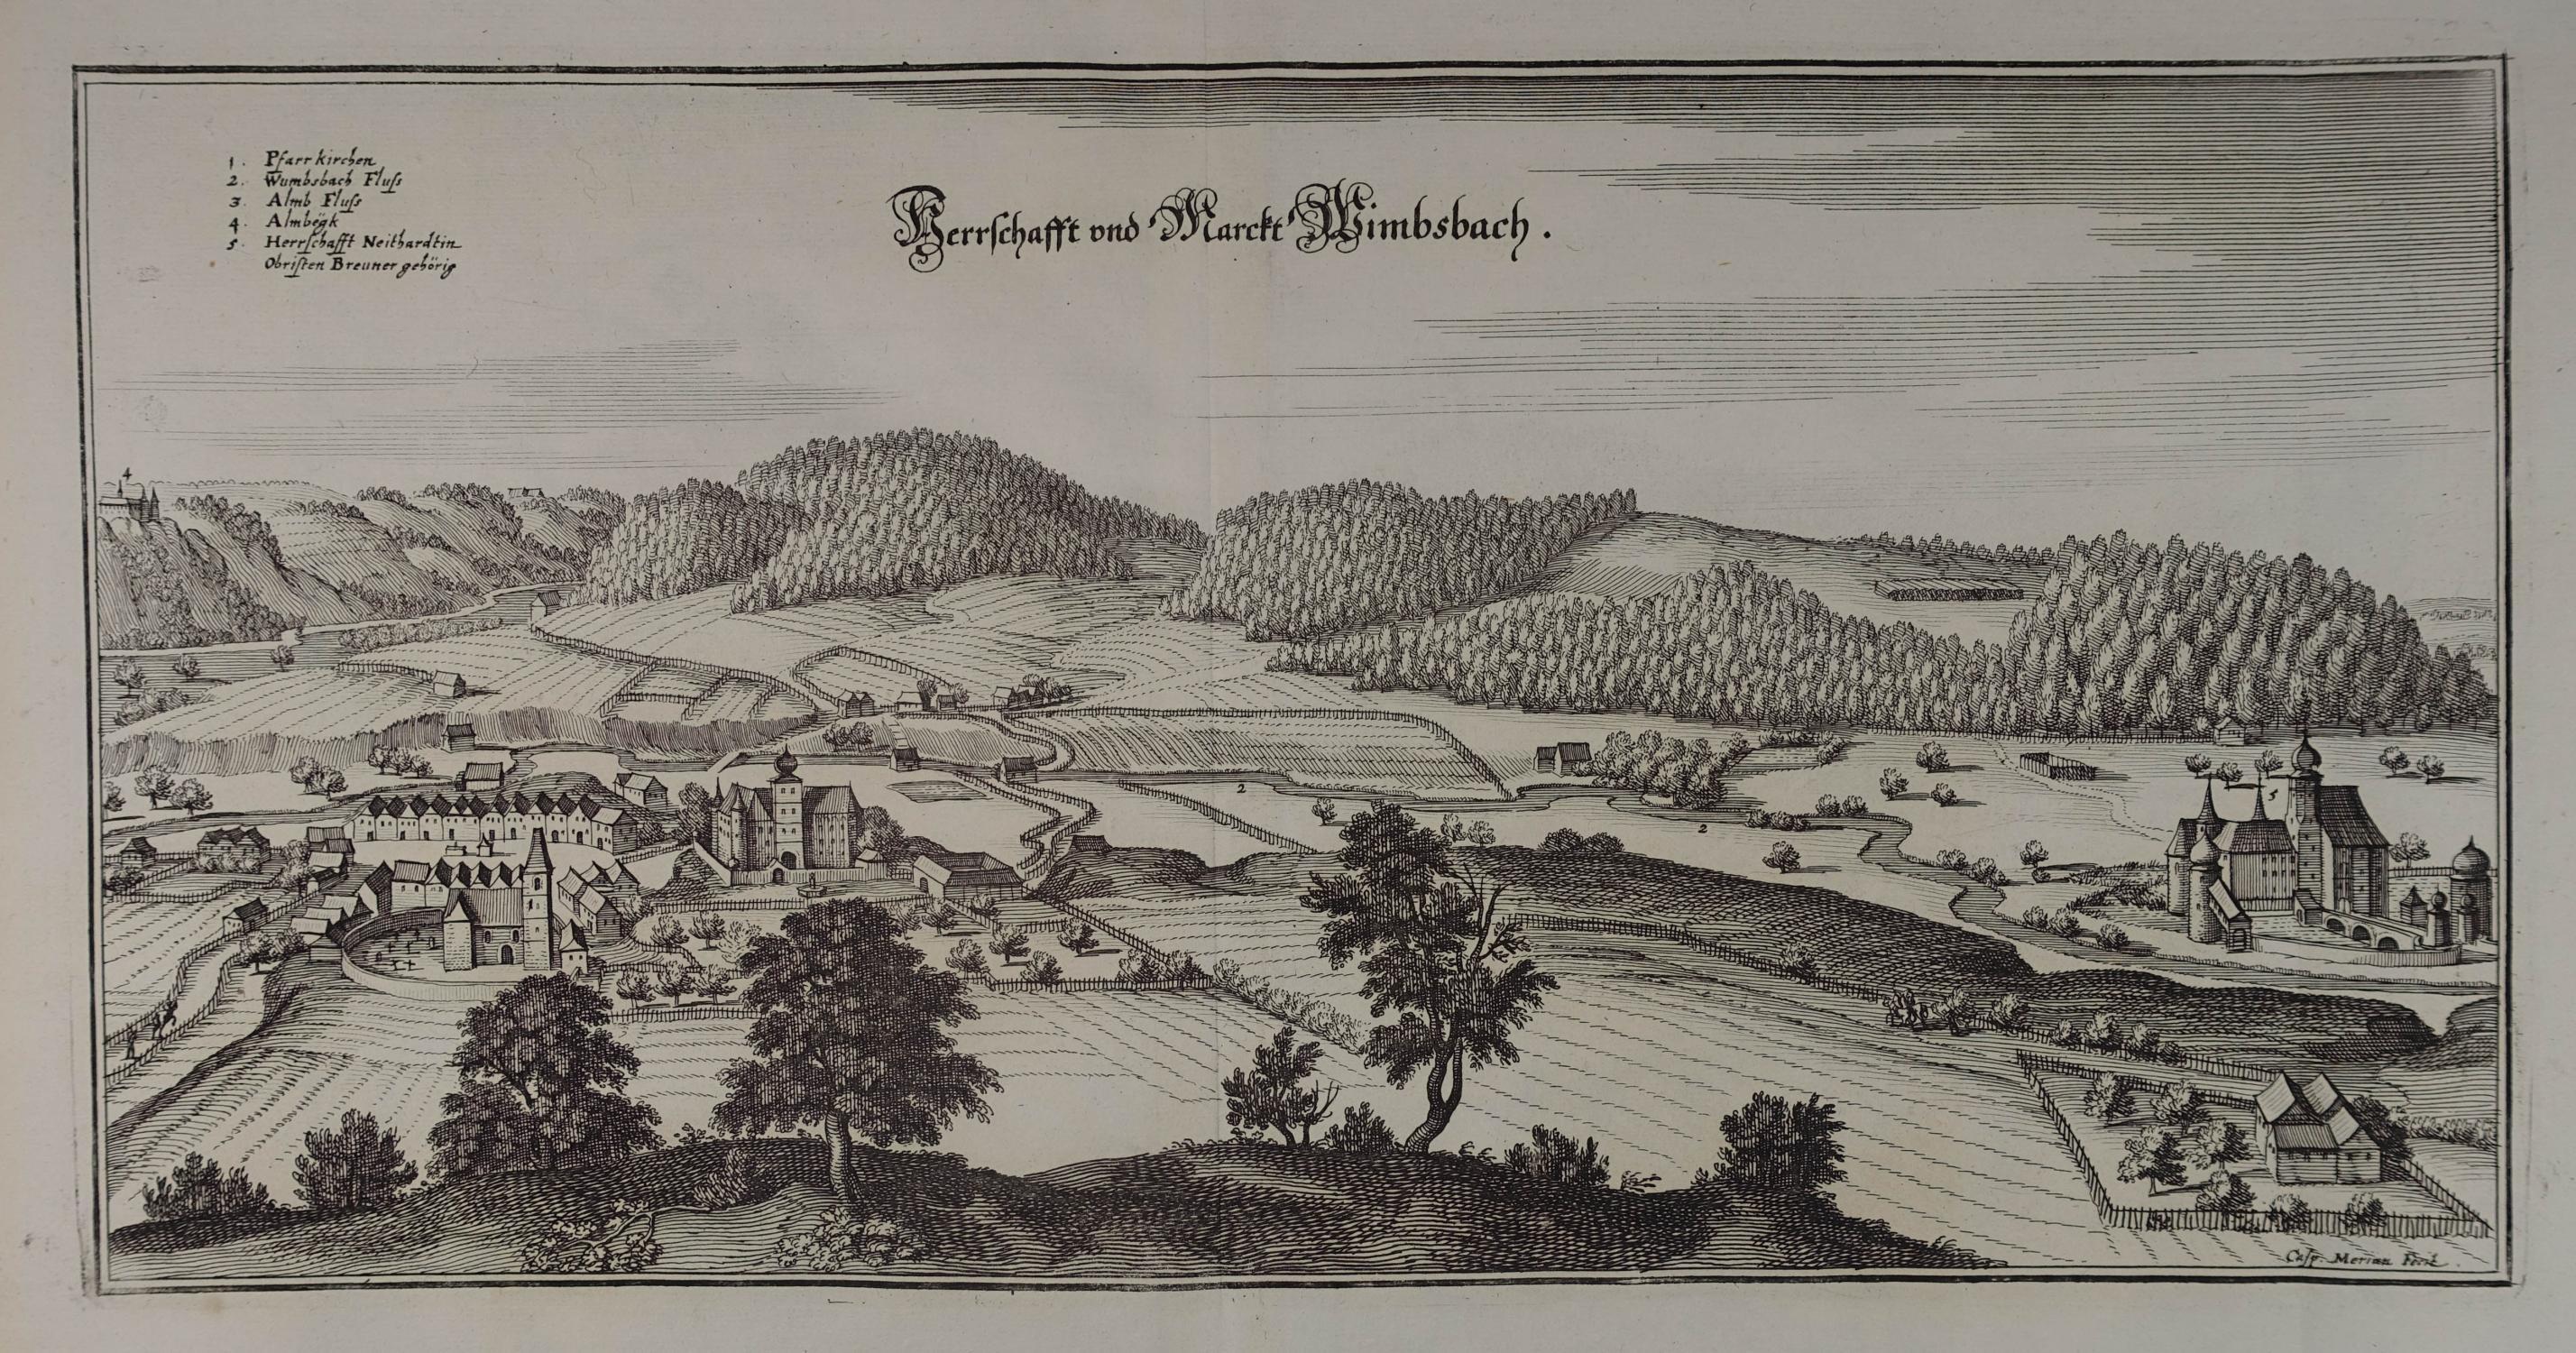 Herrschafft und Marckt Wimbsbach. Kupferstich aus M.: Bad Wimsbach -